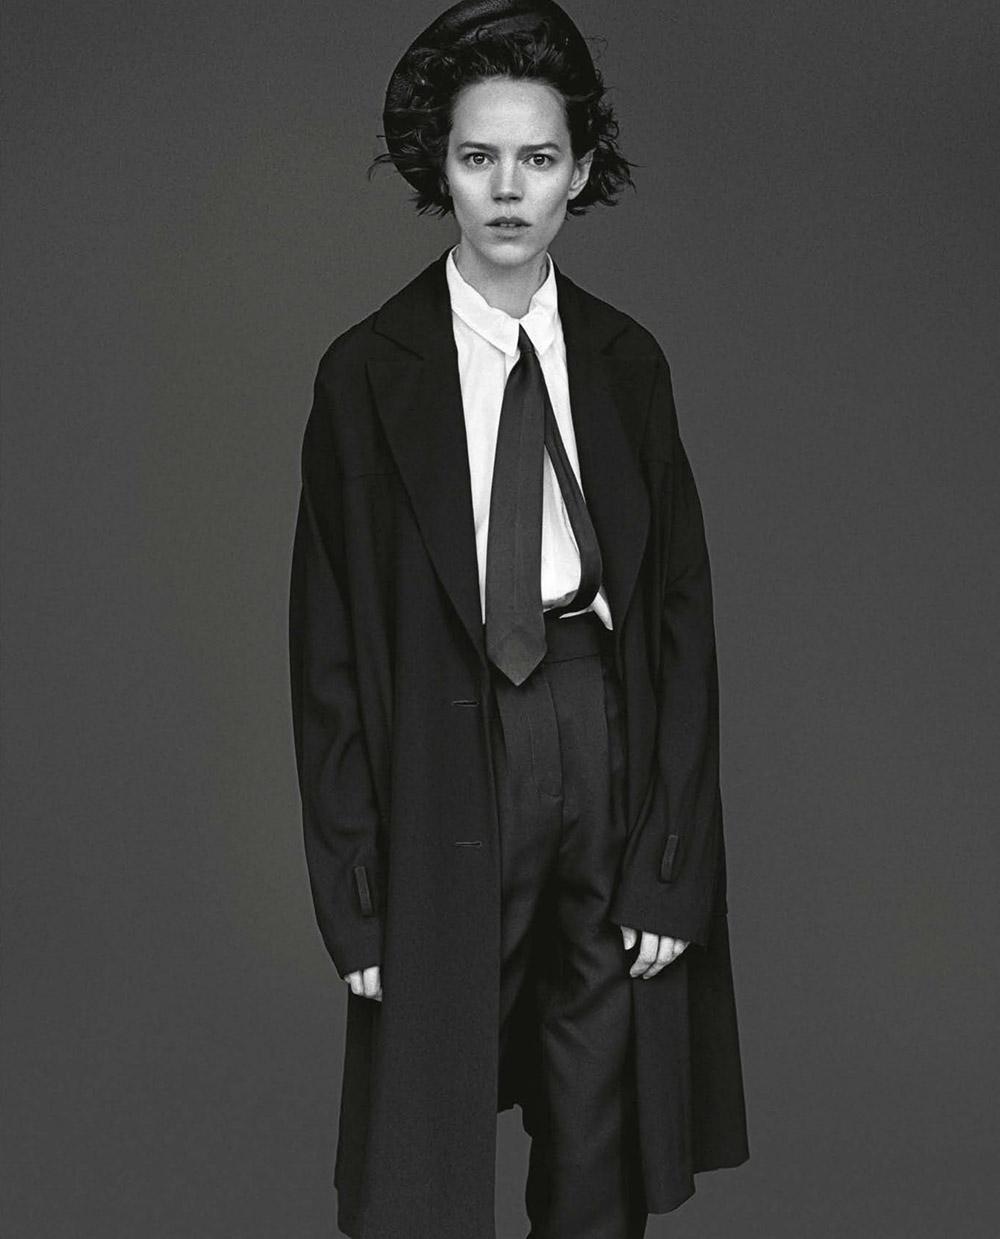 Freja Beha Erichsen covers Vogue Italia May 2020 by Alasdair McLellan